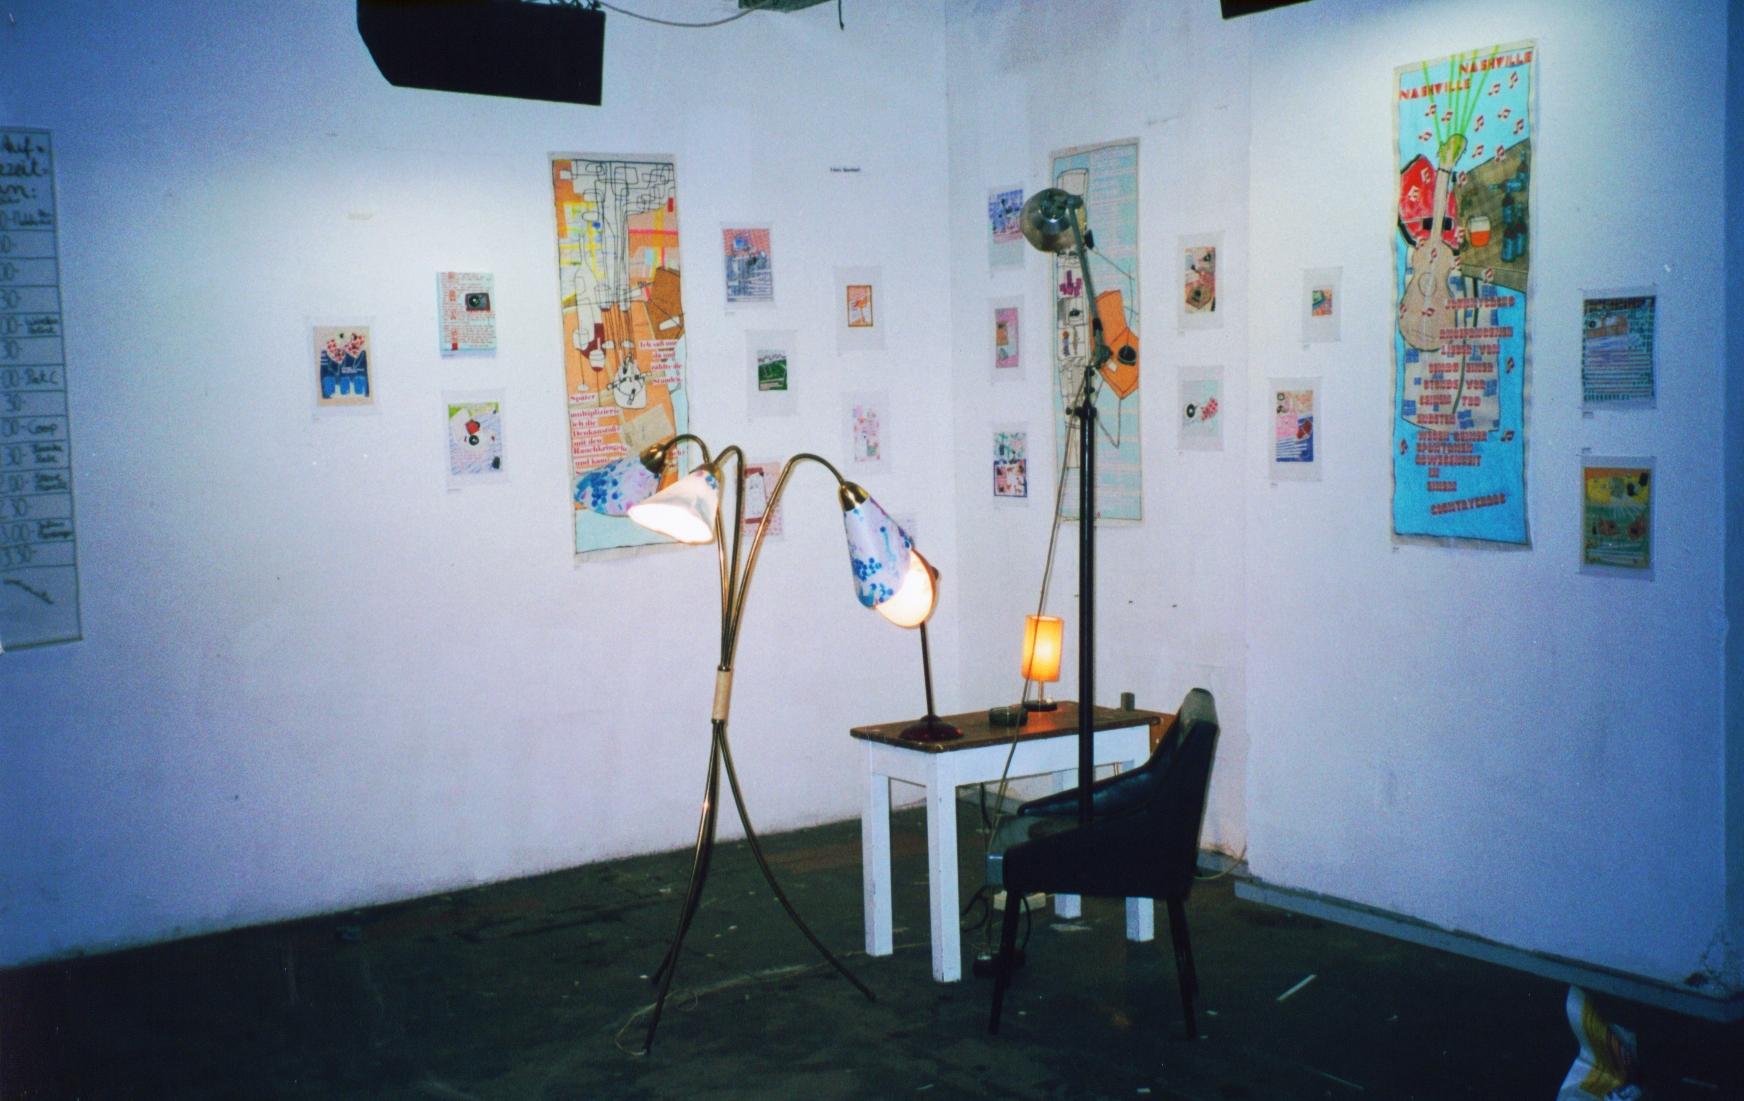 galerie neurotitan im haus schwarzenberg, berlin.